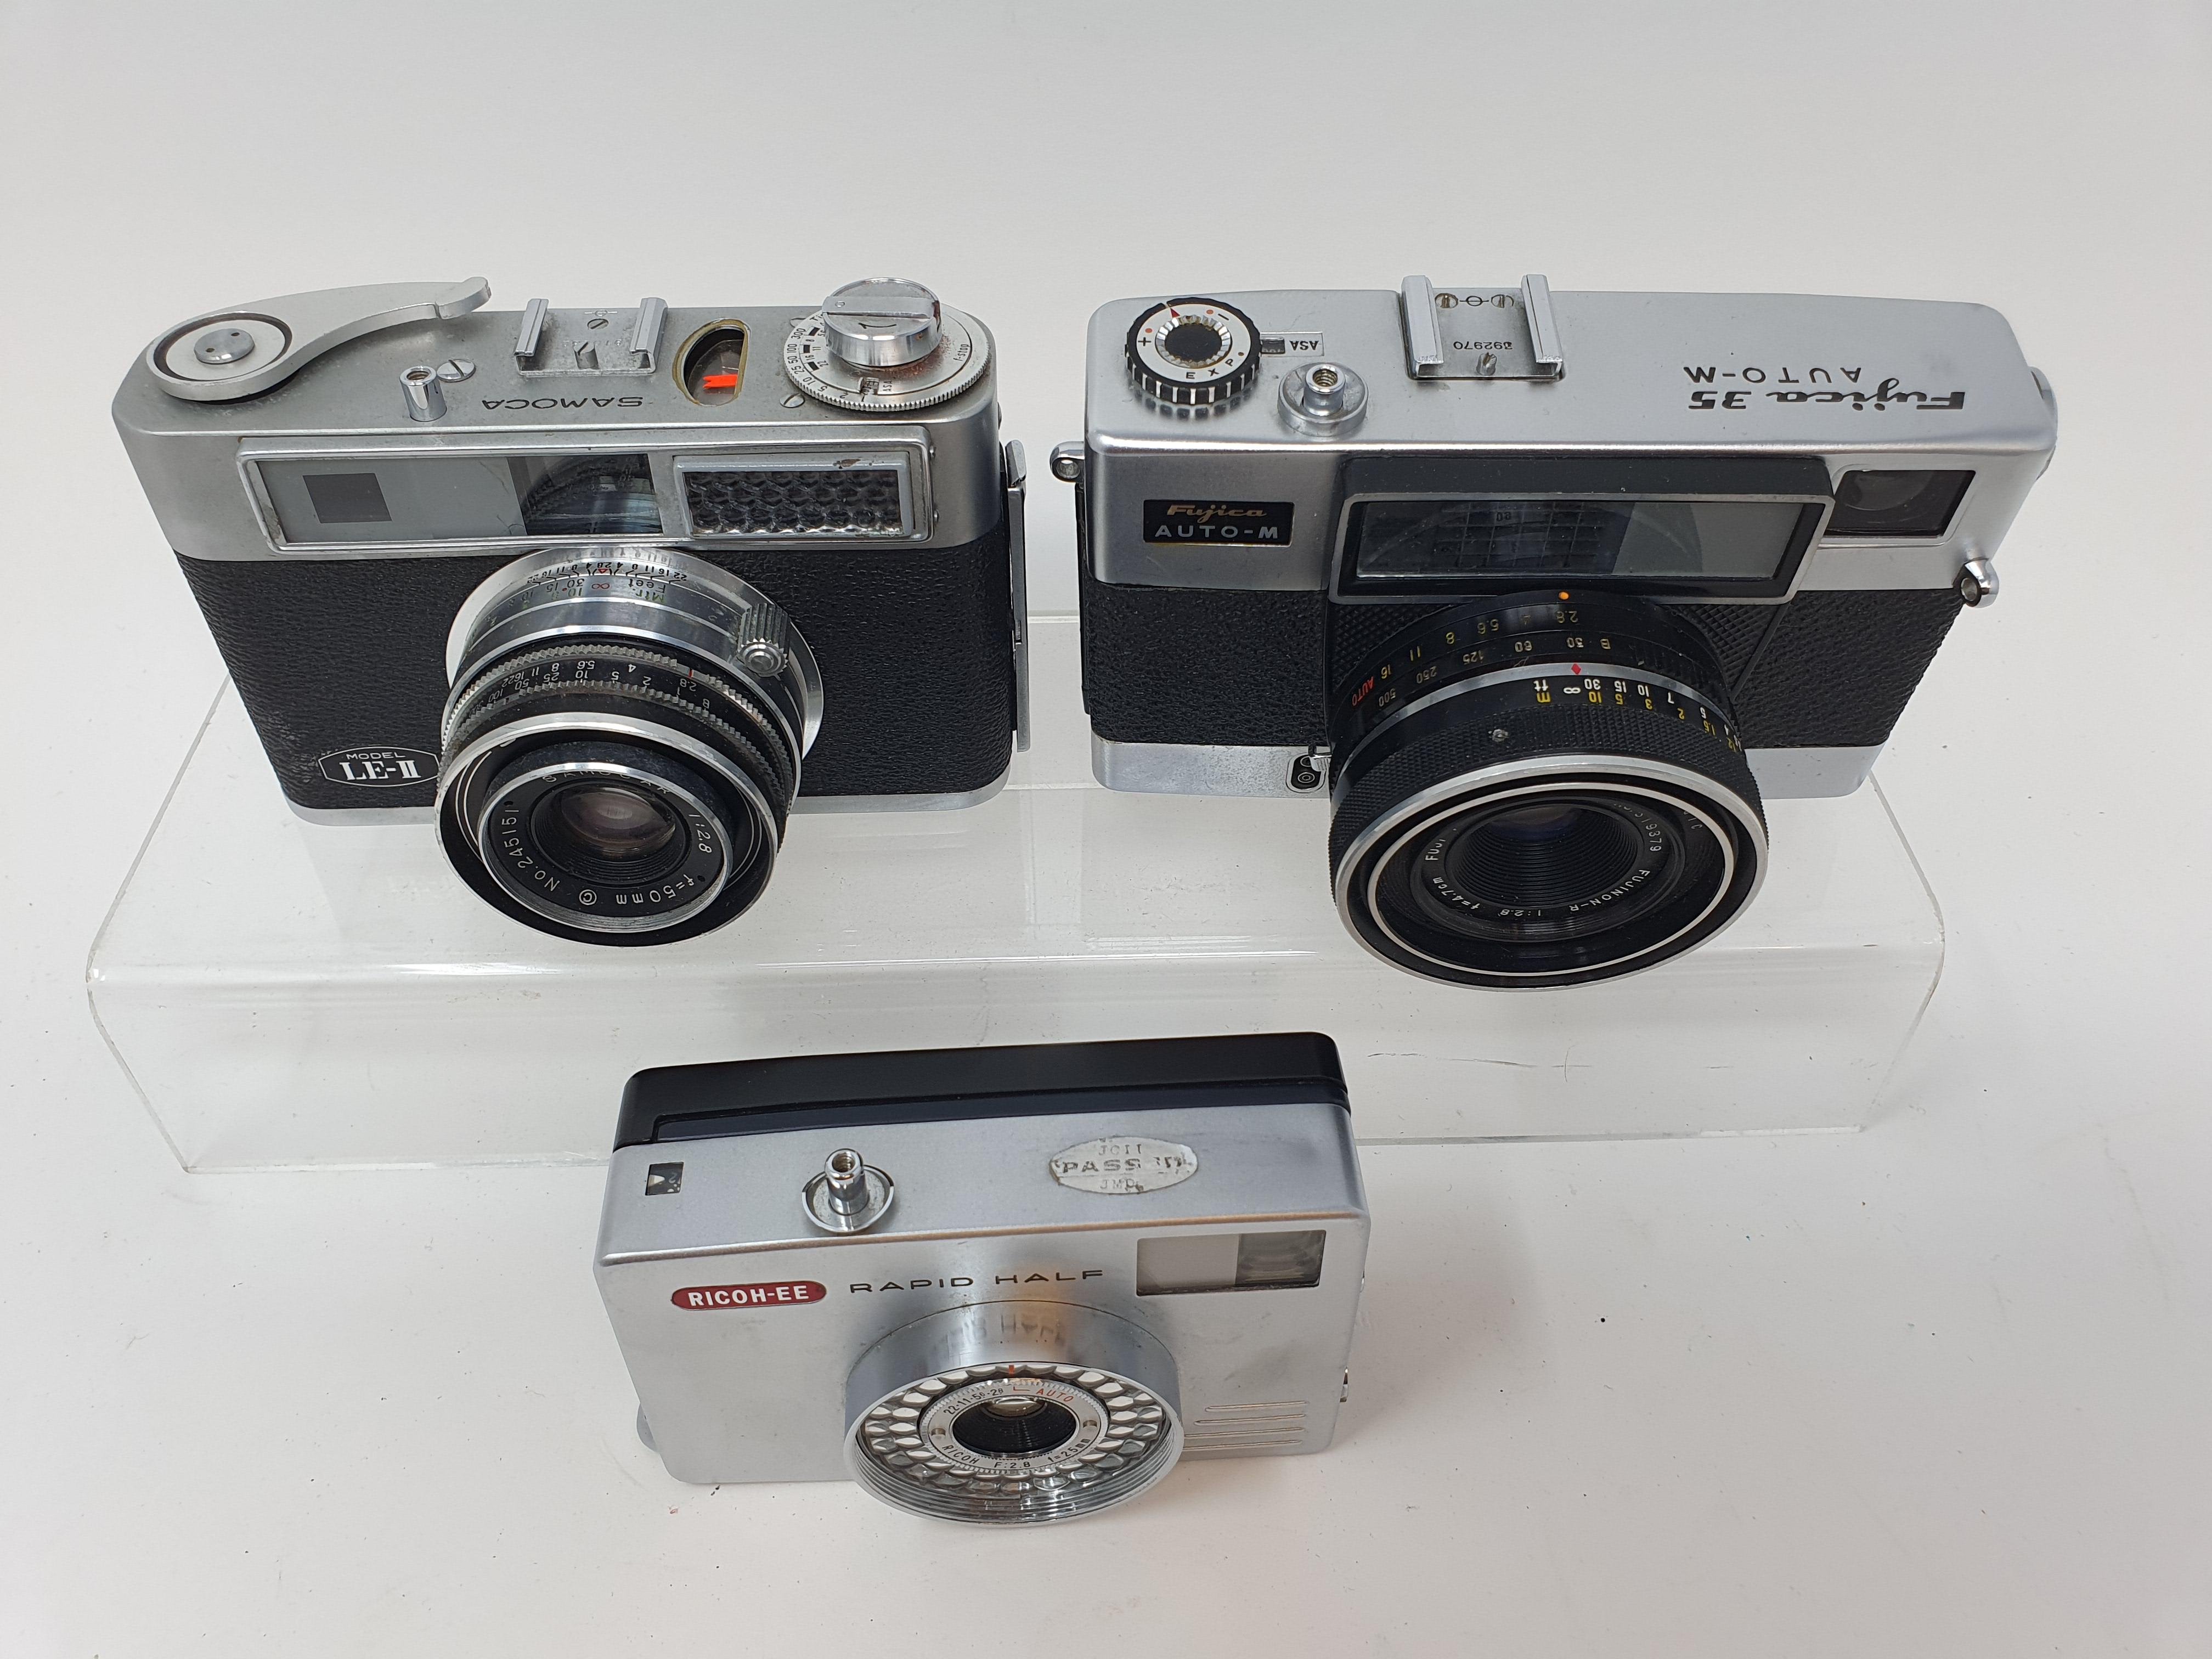 A Fujica Auto-M35 camera, a Samoca LE-II camera, and a Ricoh-EE camera (3) Provenance: Part of a - Image 2 of 2